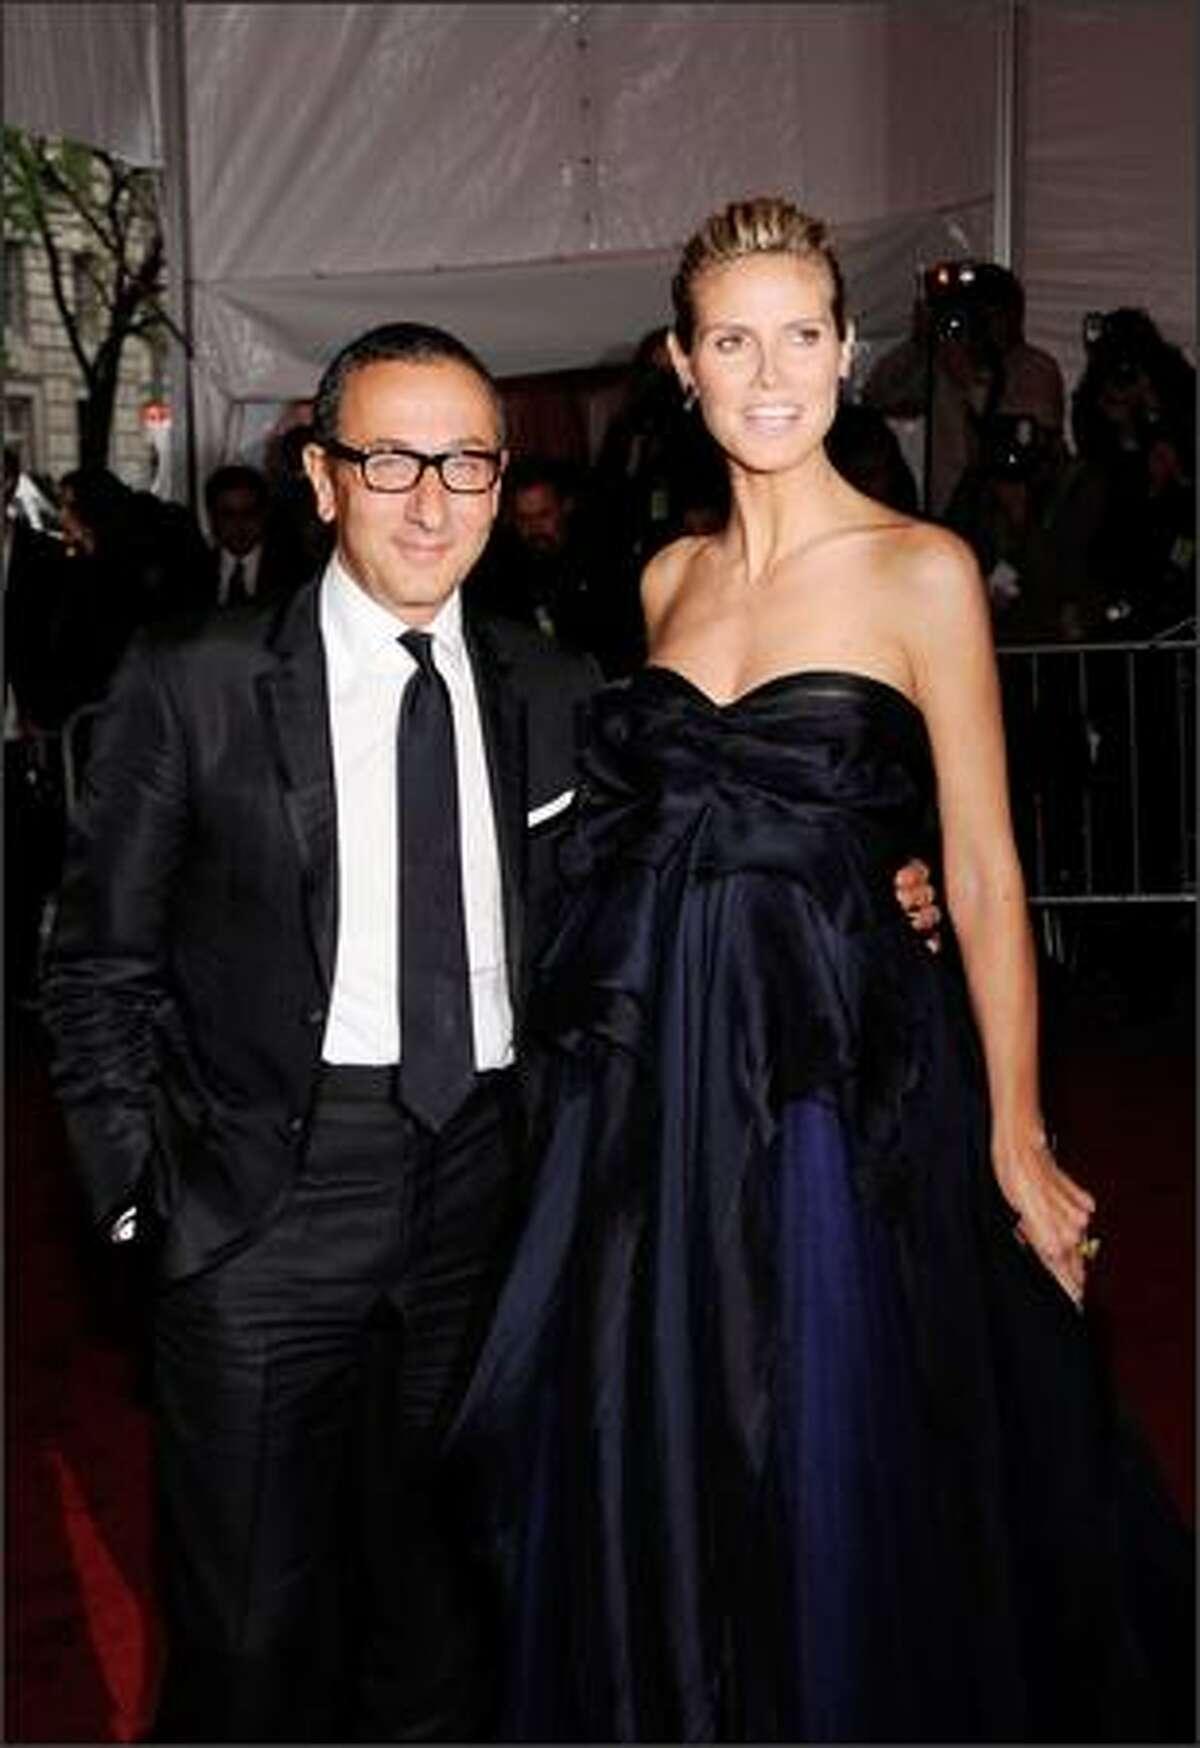 (L-R) Designer Gilles Mendel and model Heidi Klum attend